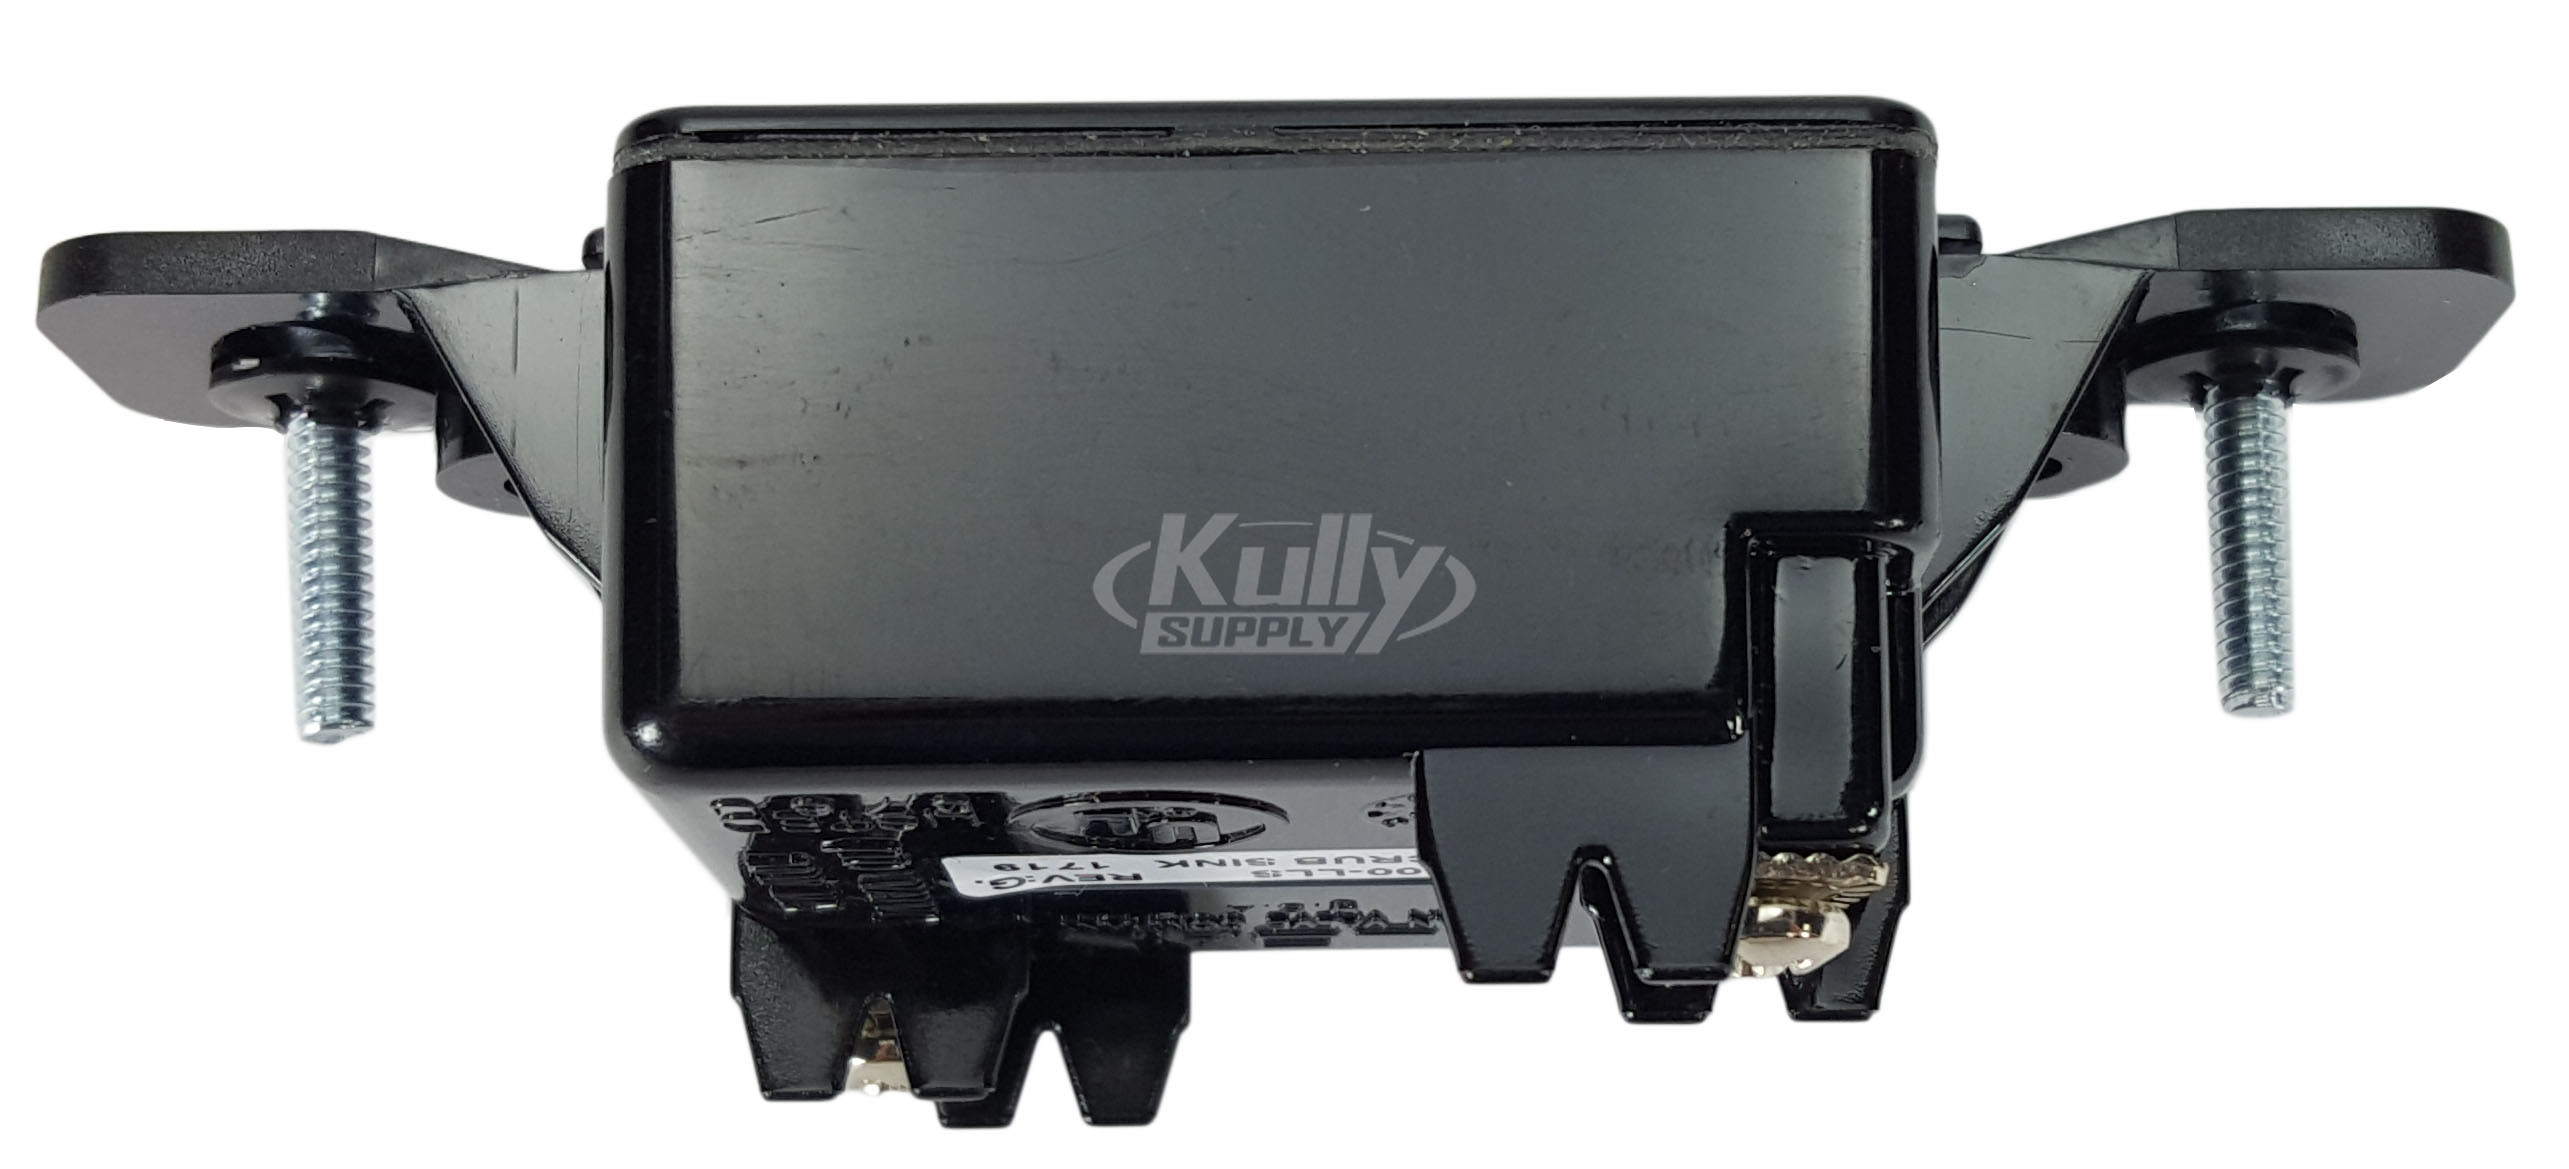 Sloan EL-1500-LLS Sensor - Scrub Sink | KullySupply.com